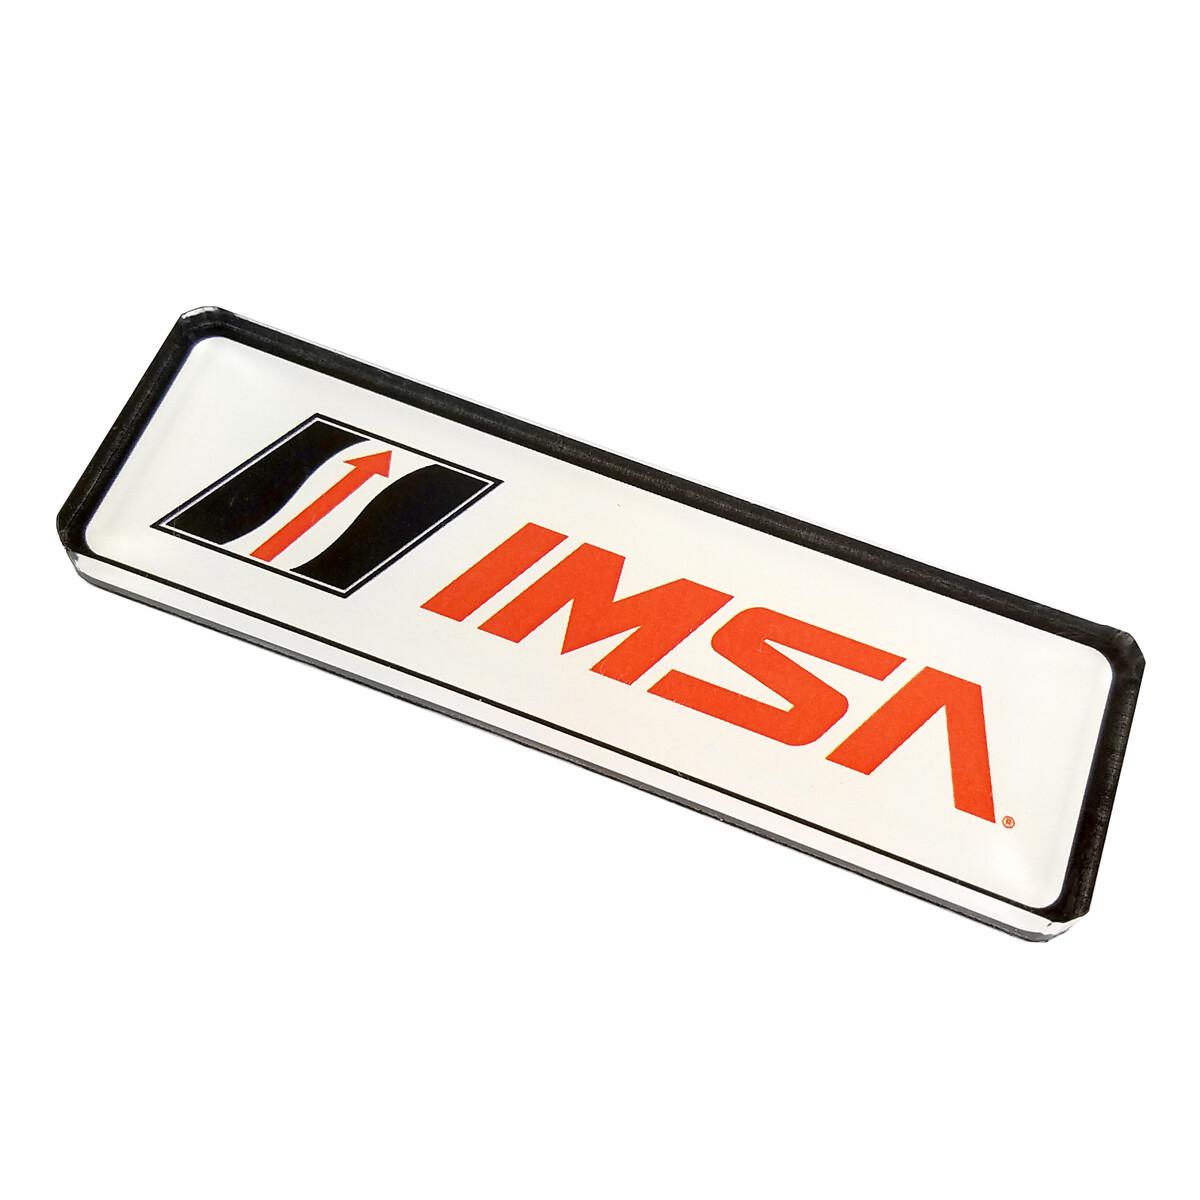 IMSA Lockup Magnet